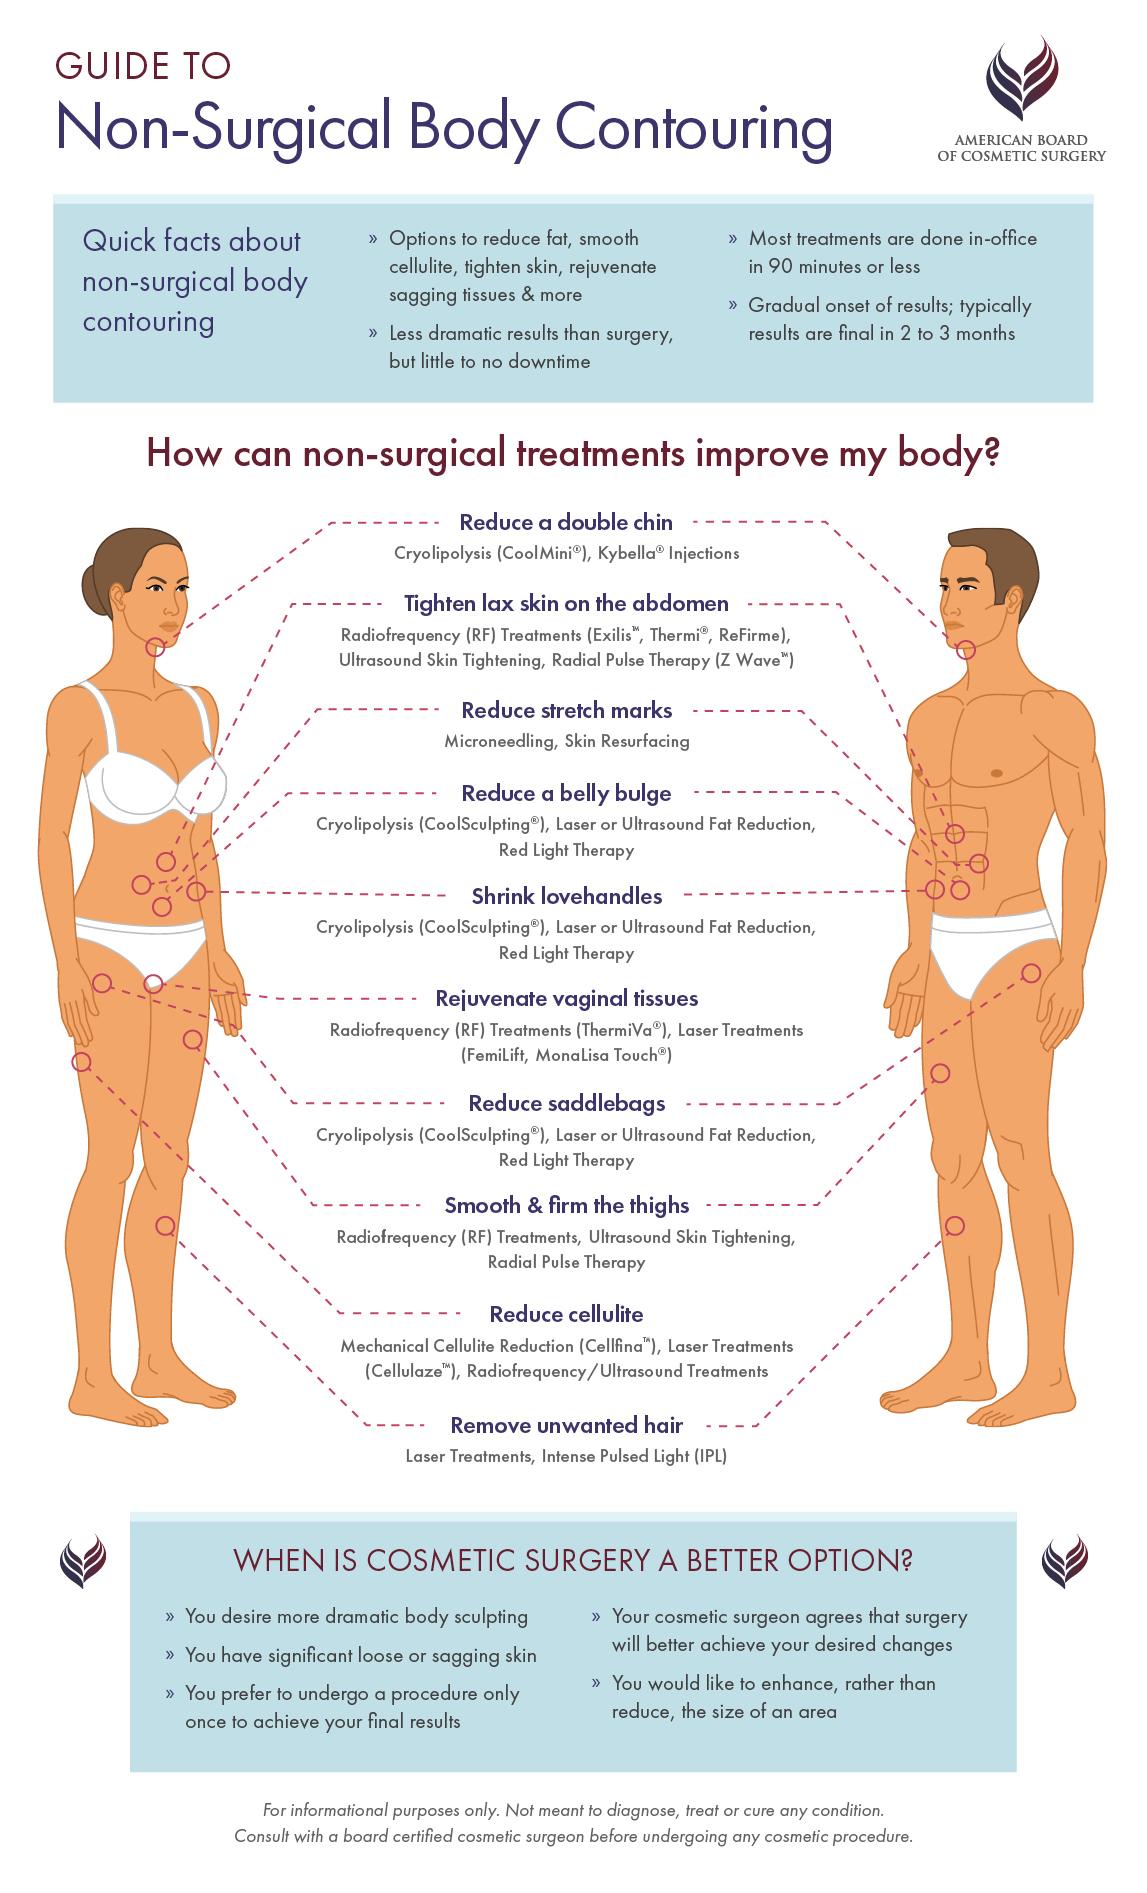 Guide to Non-Surgical Body Contouring